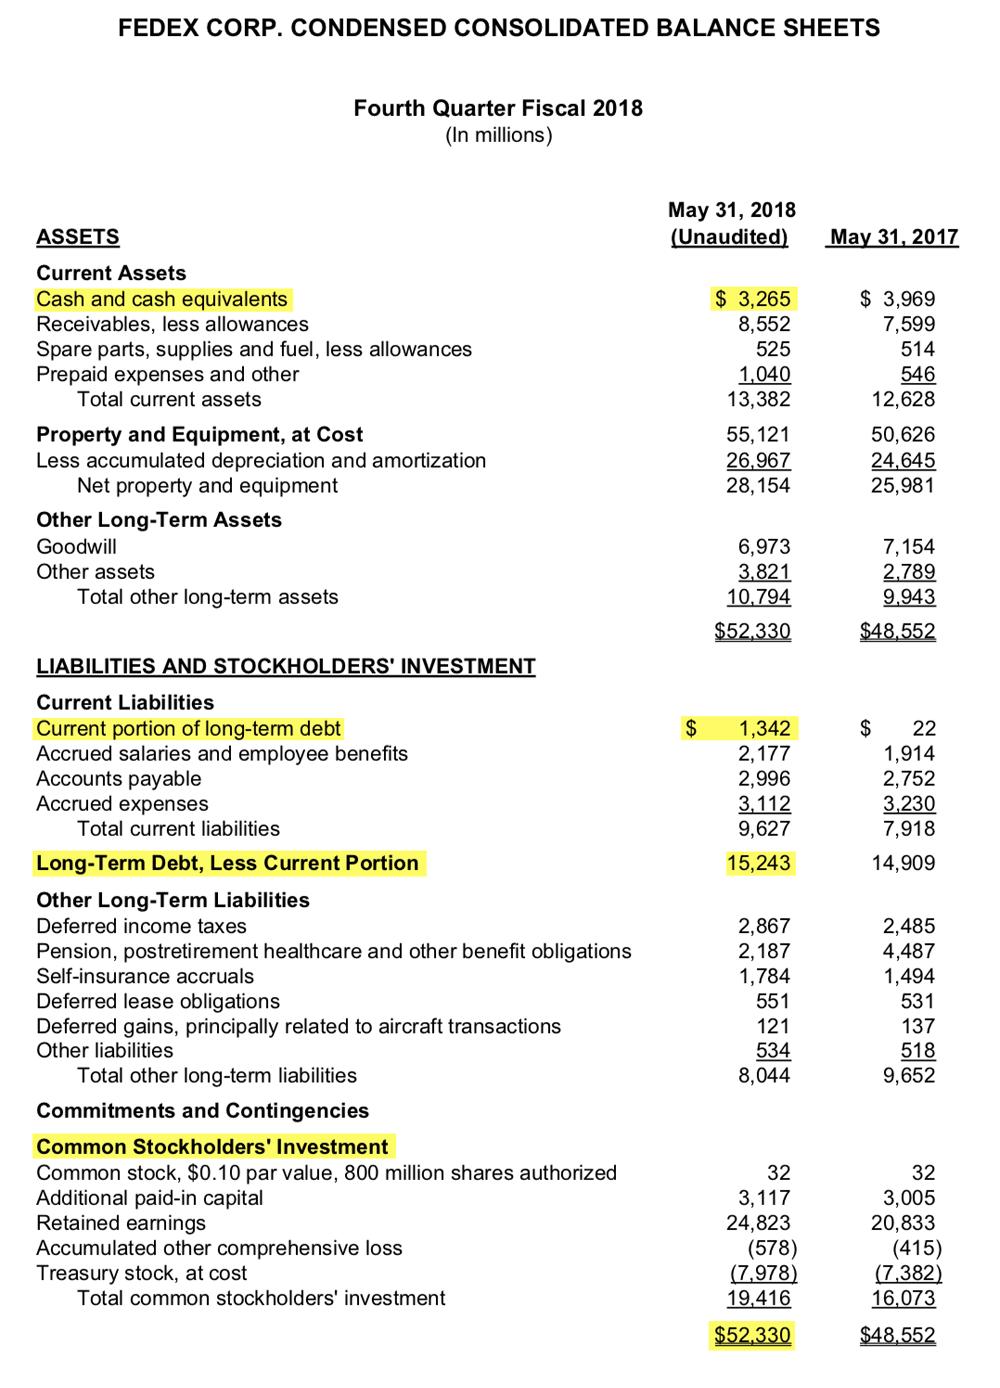 Cтраница 17 отчета FedEx за 2018 финансовый год